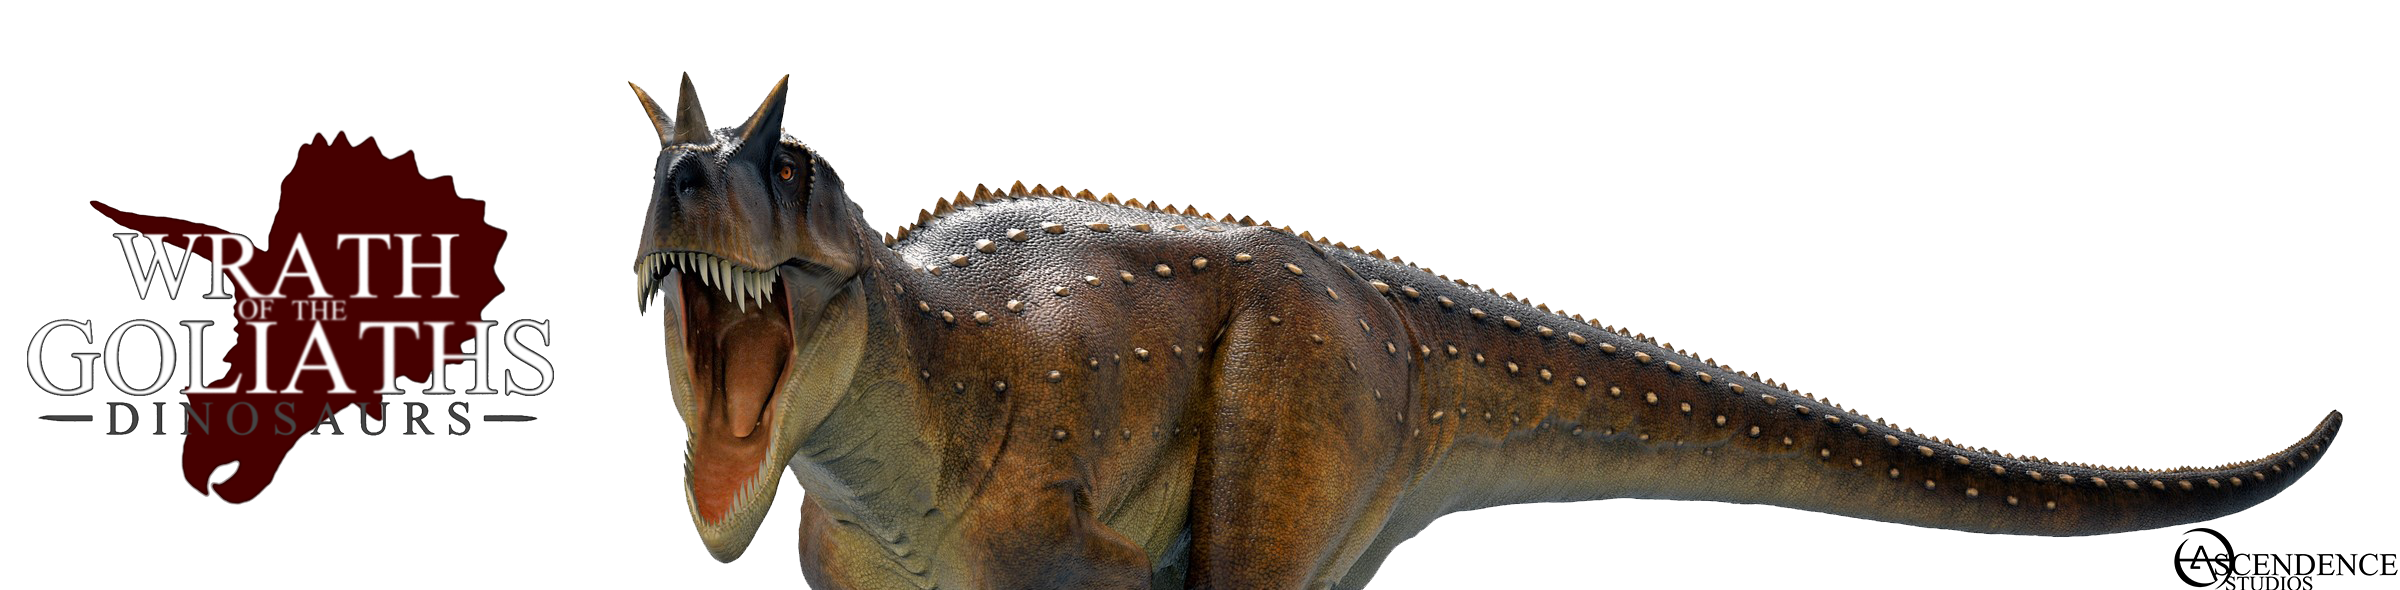 Ceratosaurus Footer 1